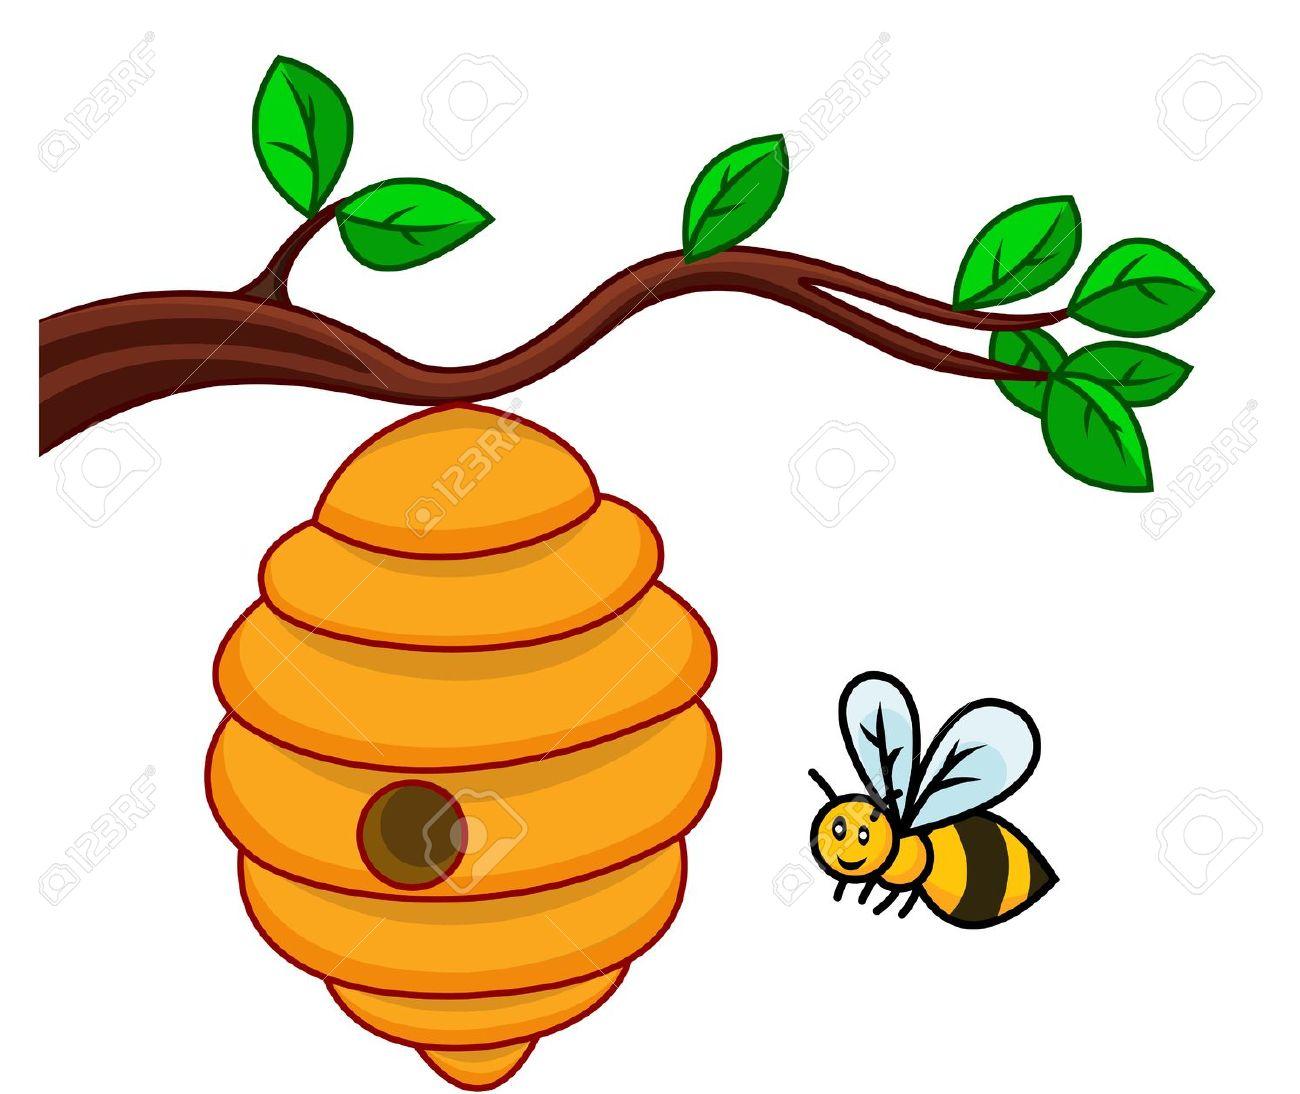 beehive: illustration of .